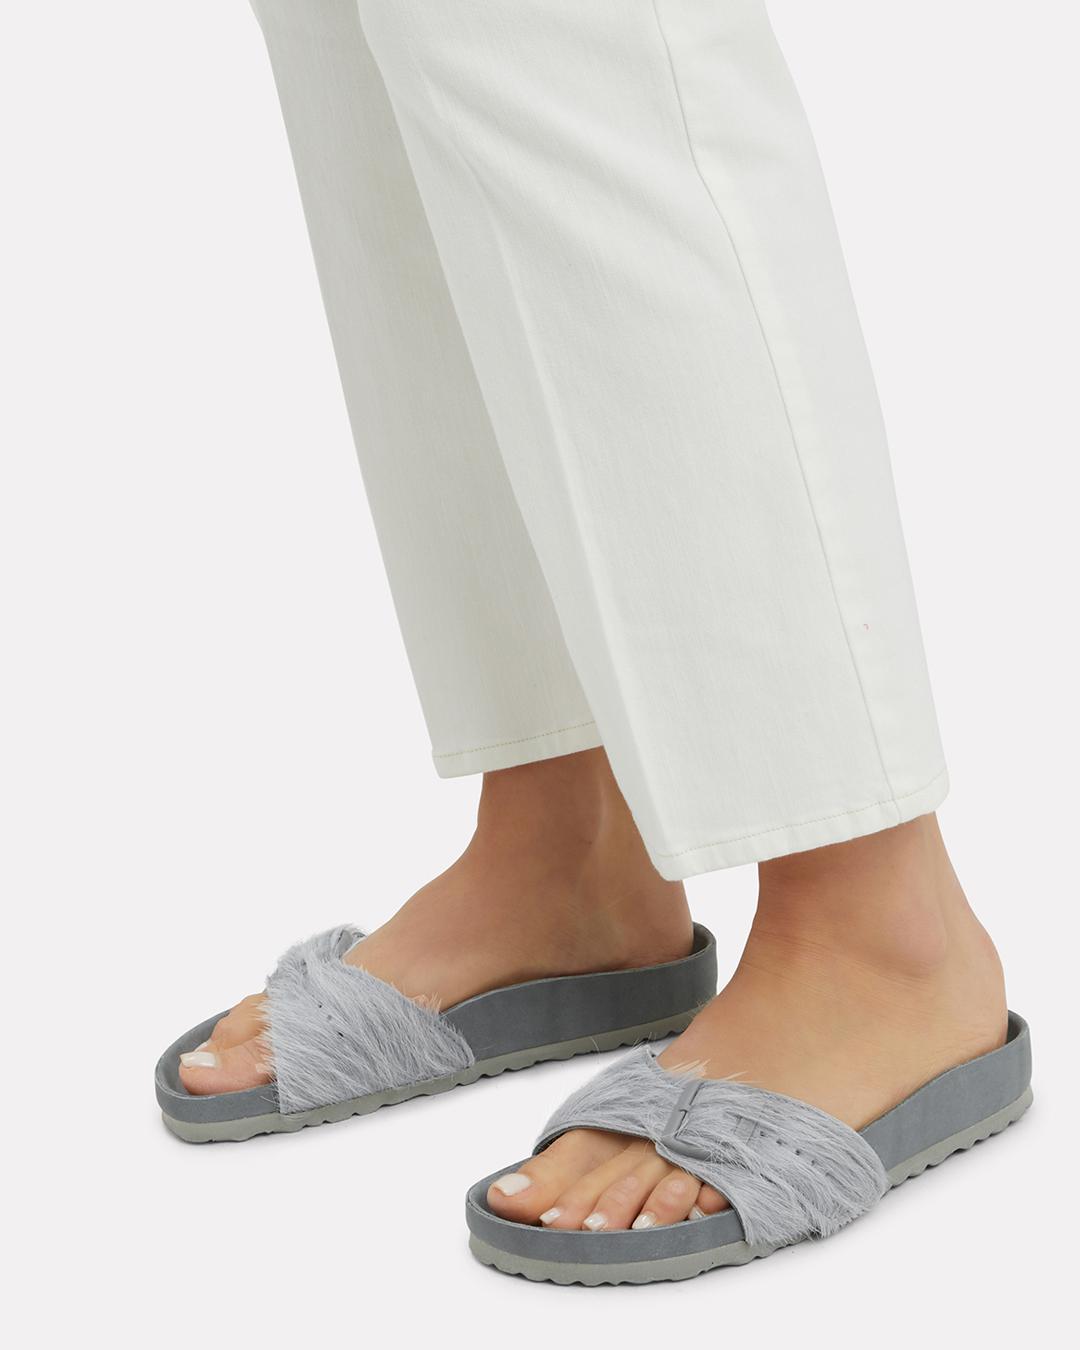 Rick Owens Rick Owens x Birkenstock Madrid sandals Grey from Farfetch:Linkshare:Affiliate:CPA:US:US | more